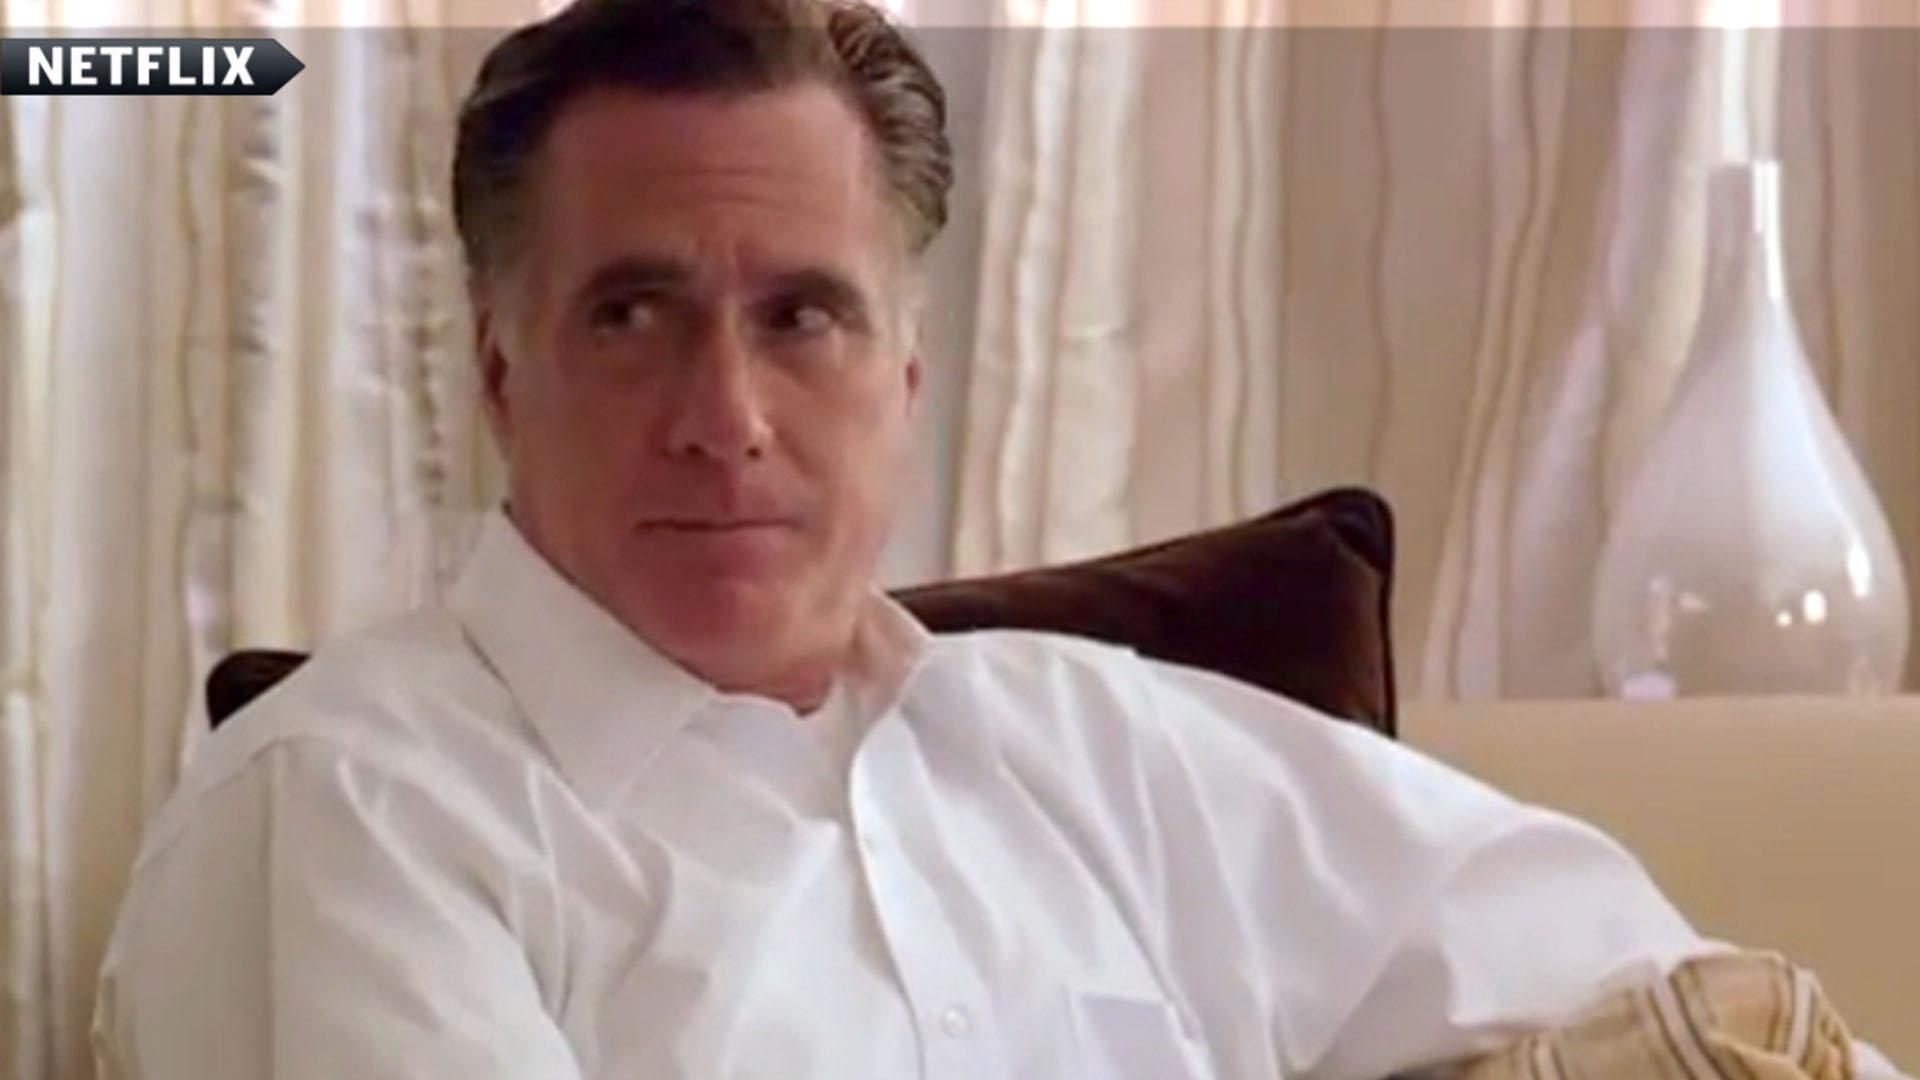 The Mitt Romney documentary